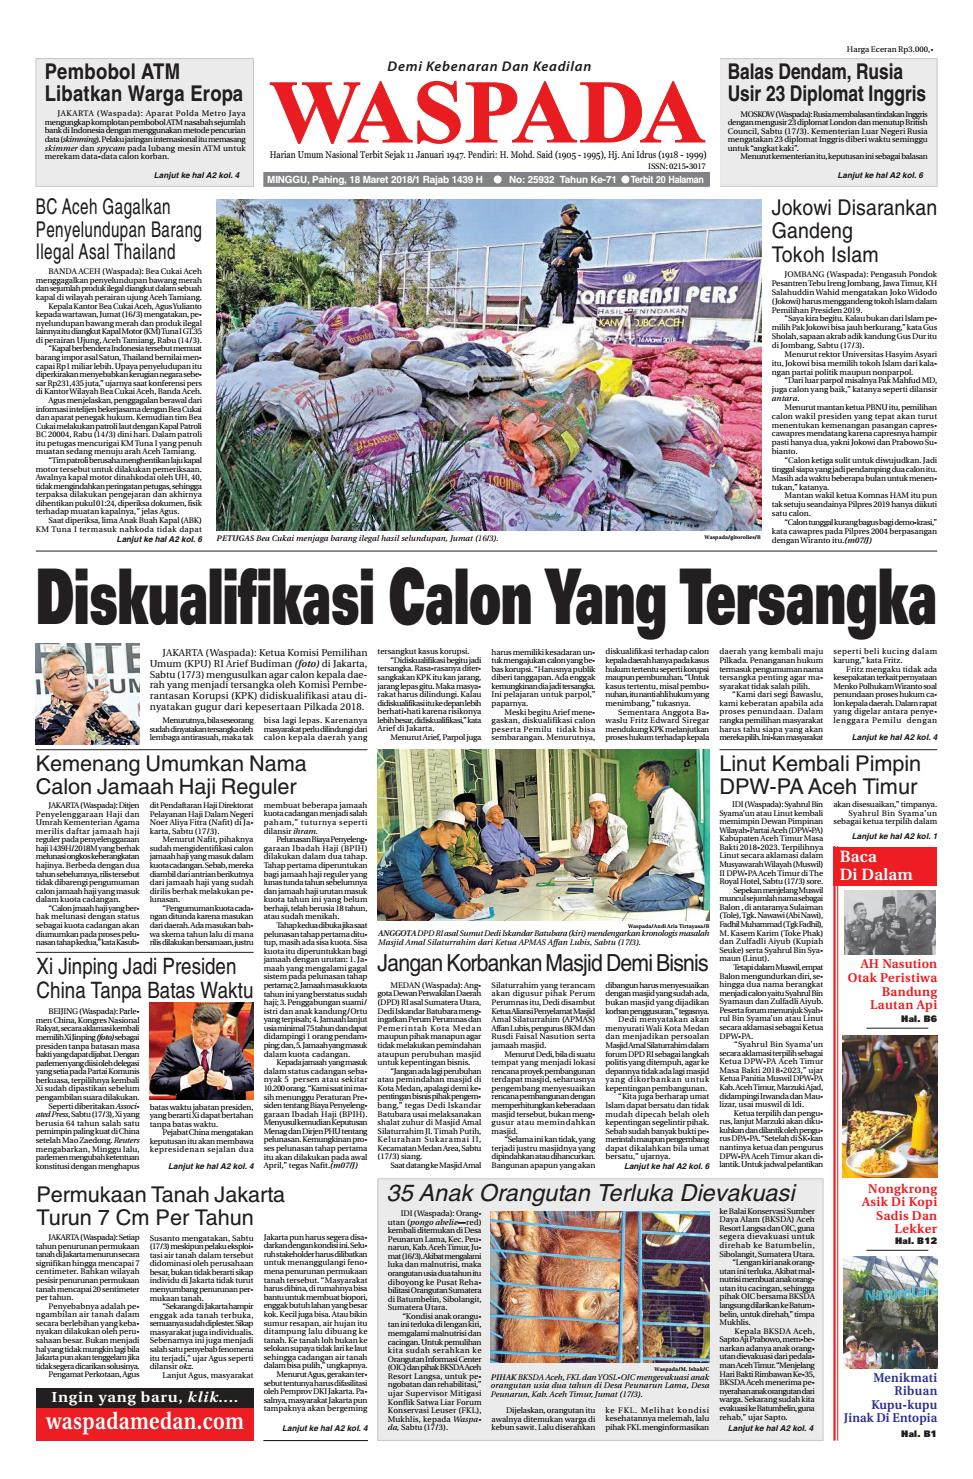 Waspada Minggu 18 Maret 2018 By Harian Issuu Produk Ukm Bumn Kain Batik Middle Premium Sutera